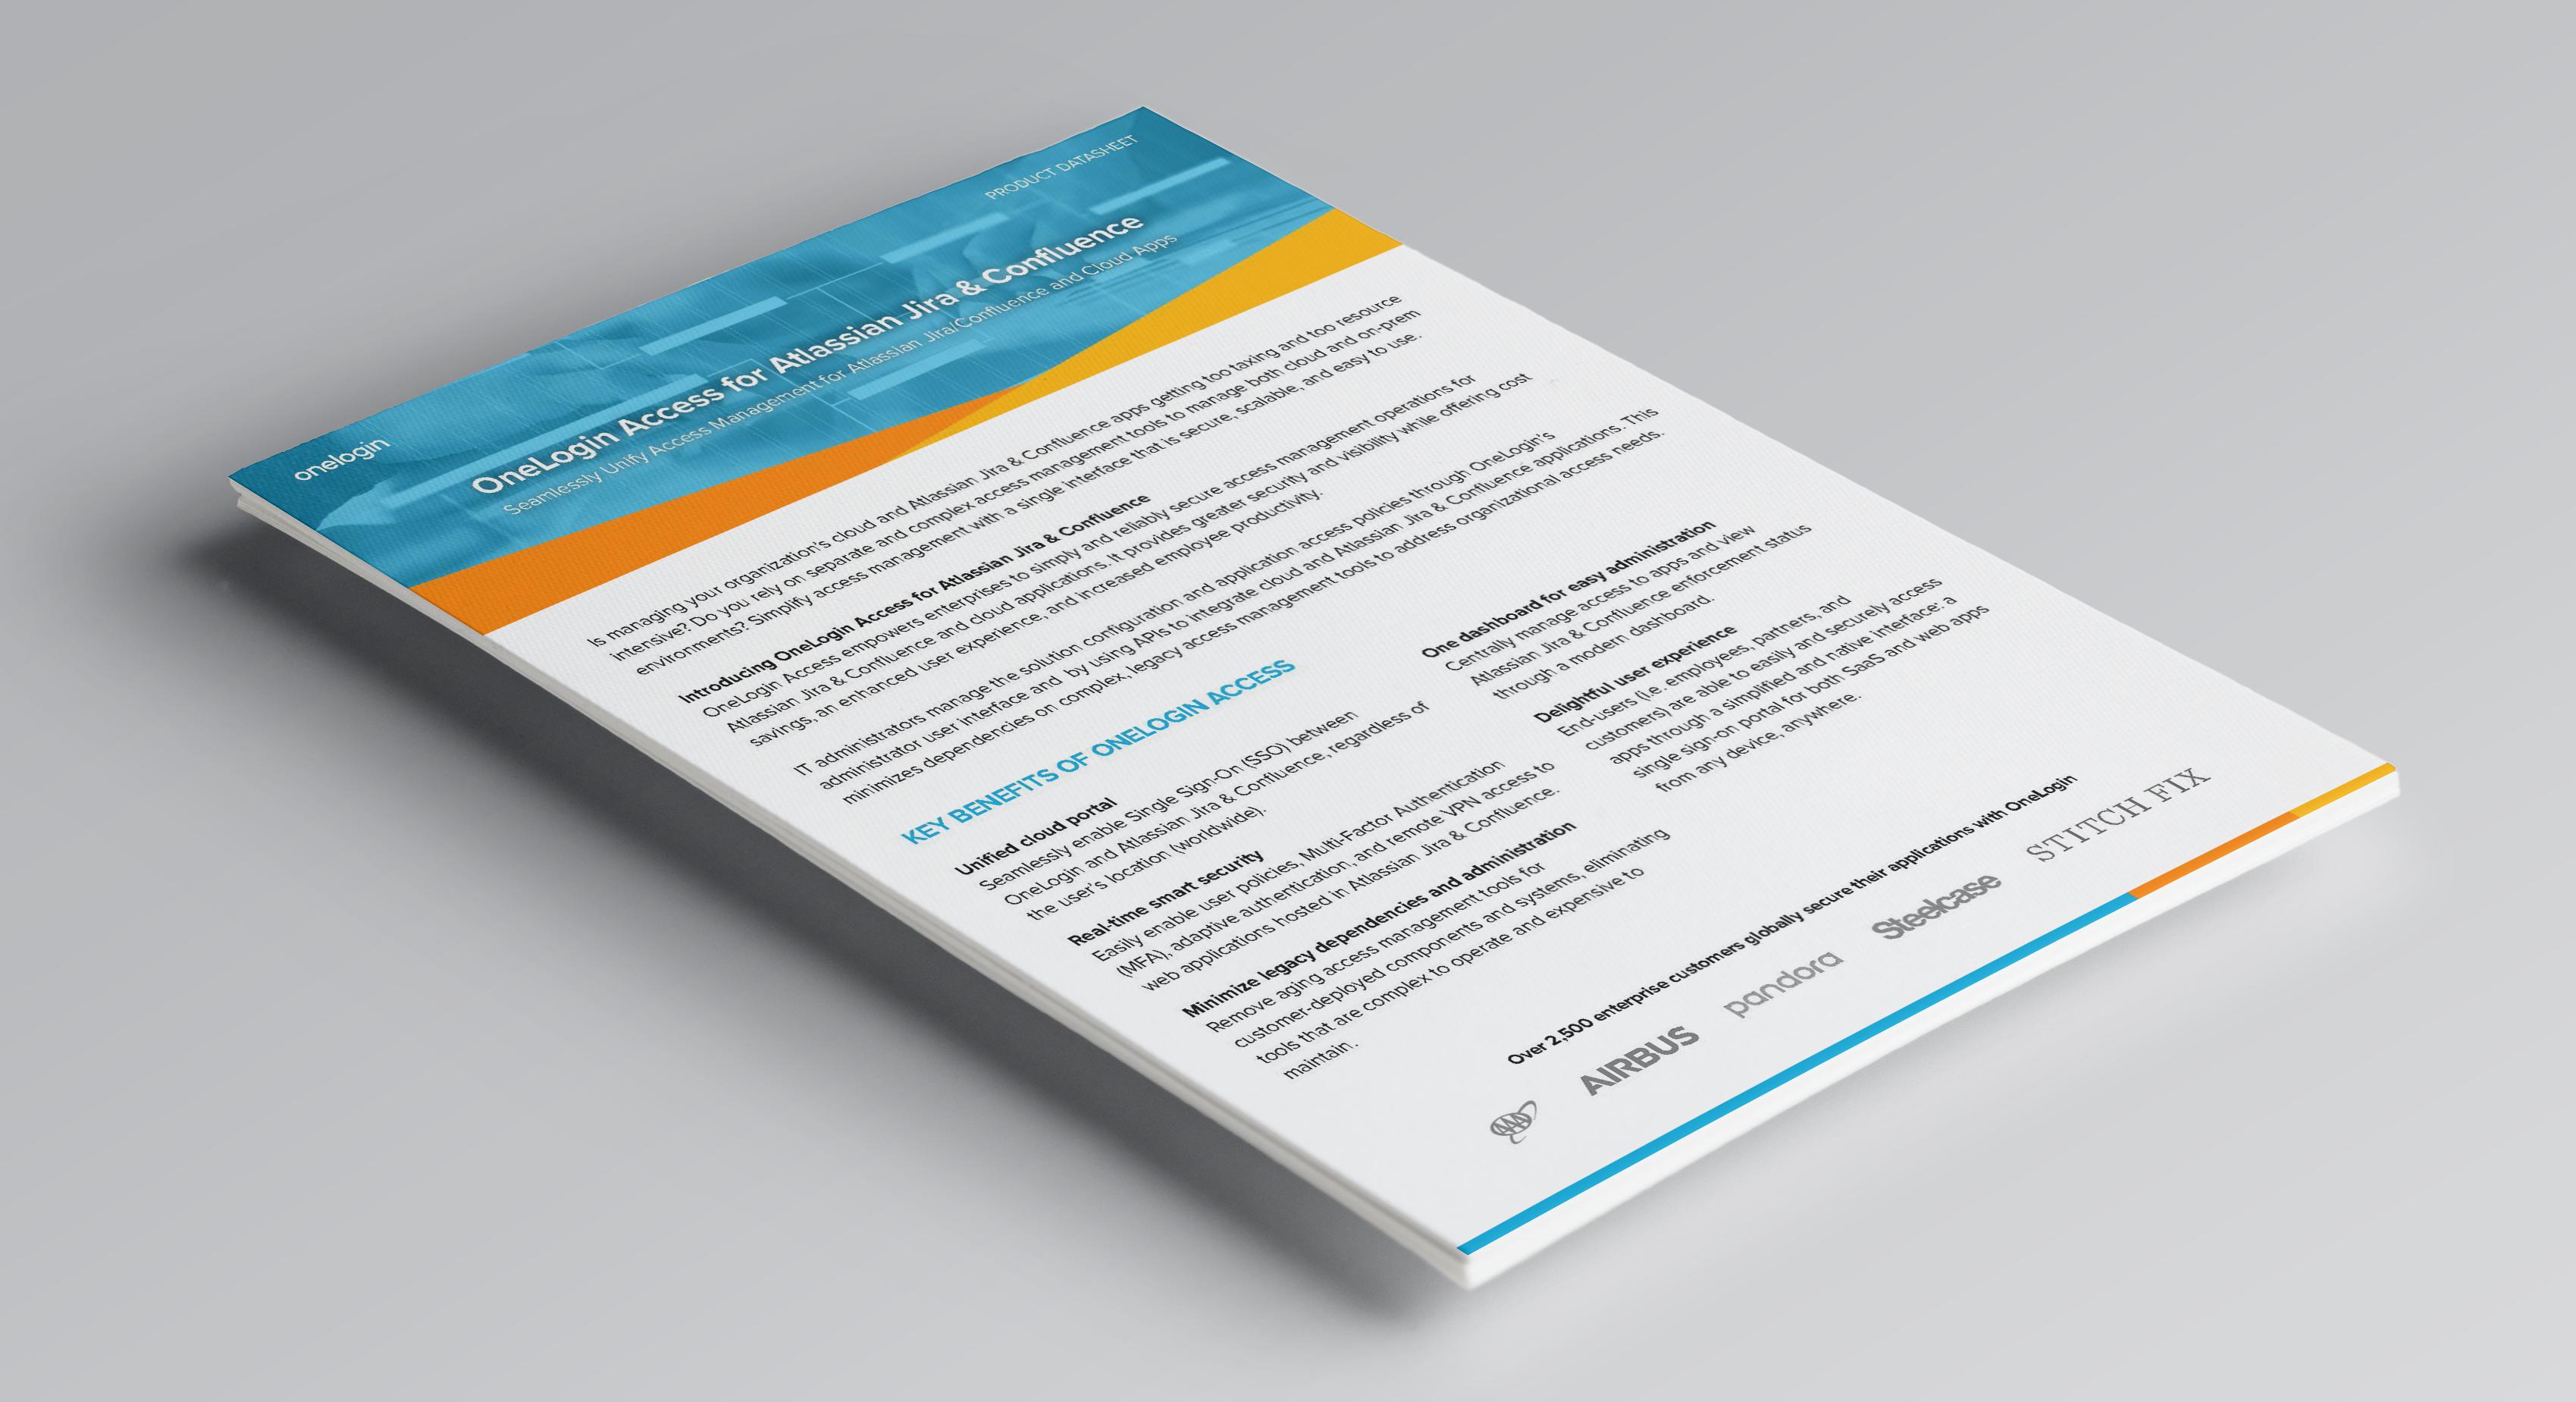 OneLogin Access for Atlassian Jira & Confluence